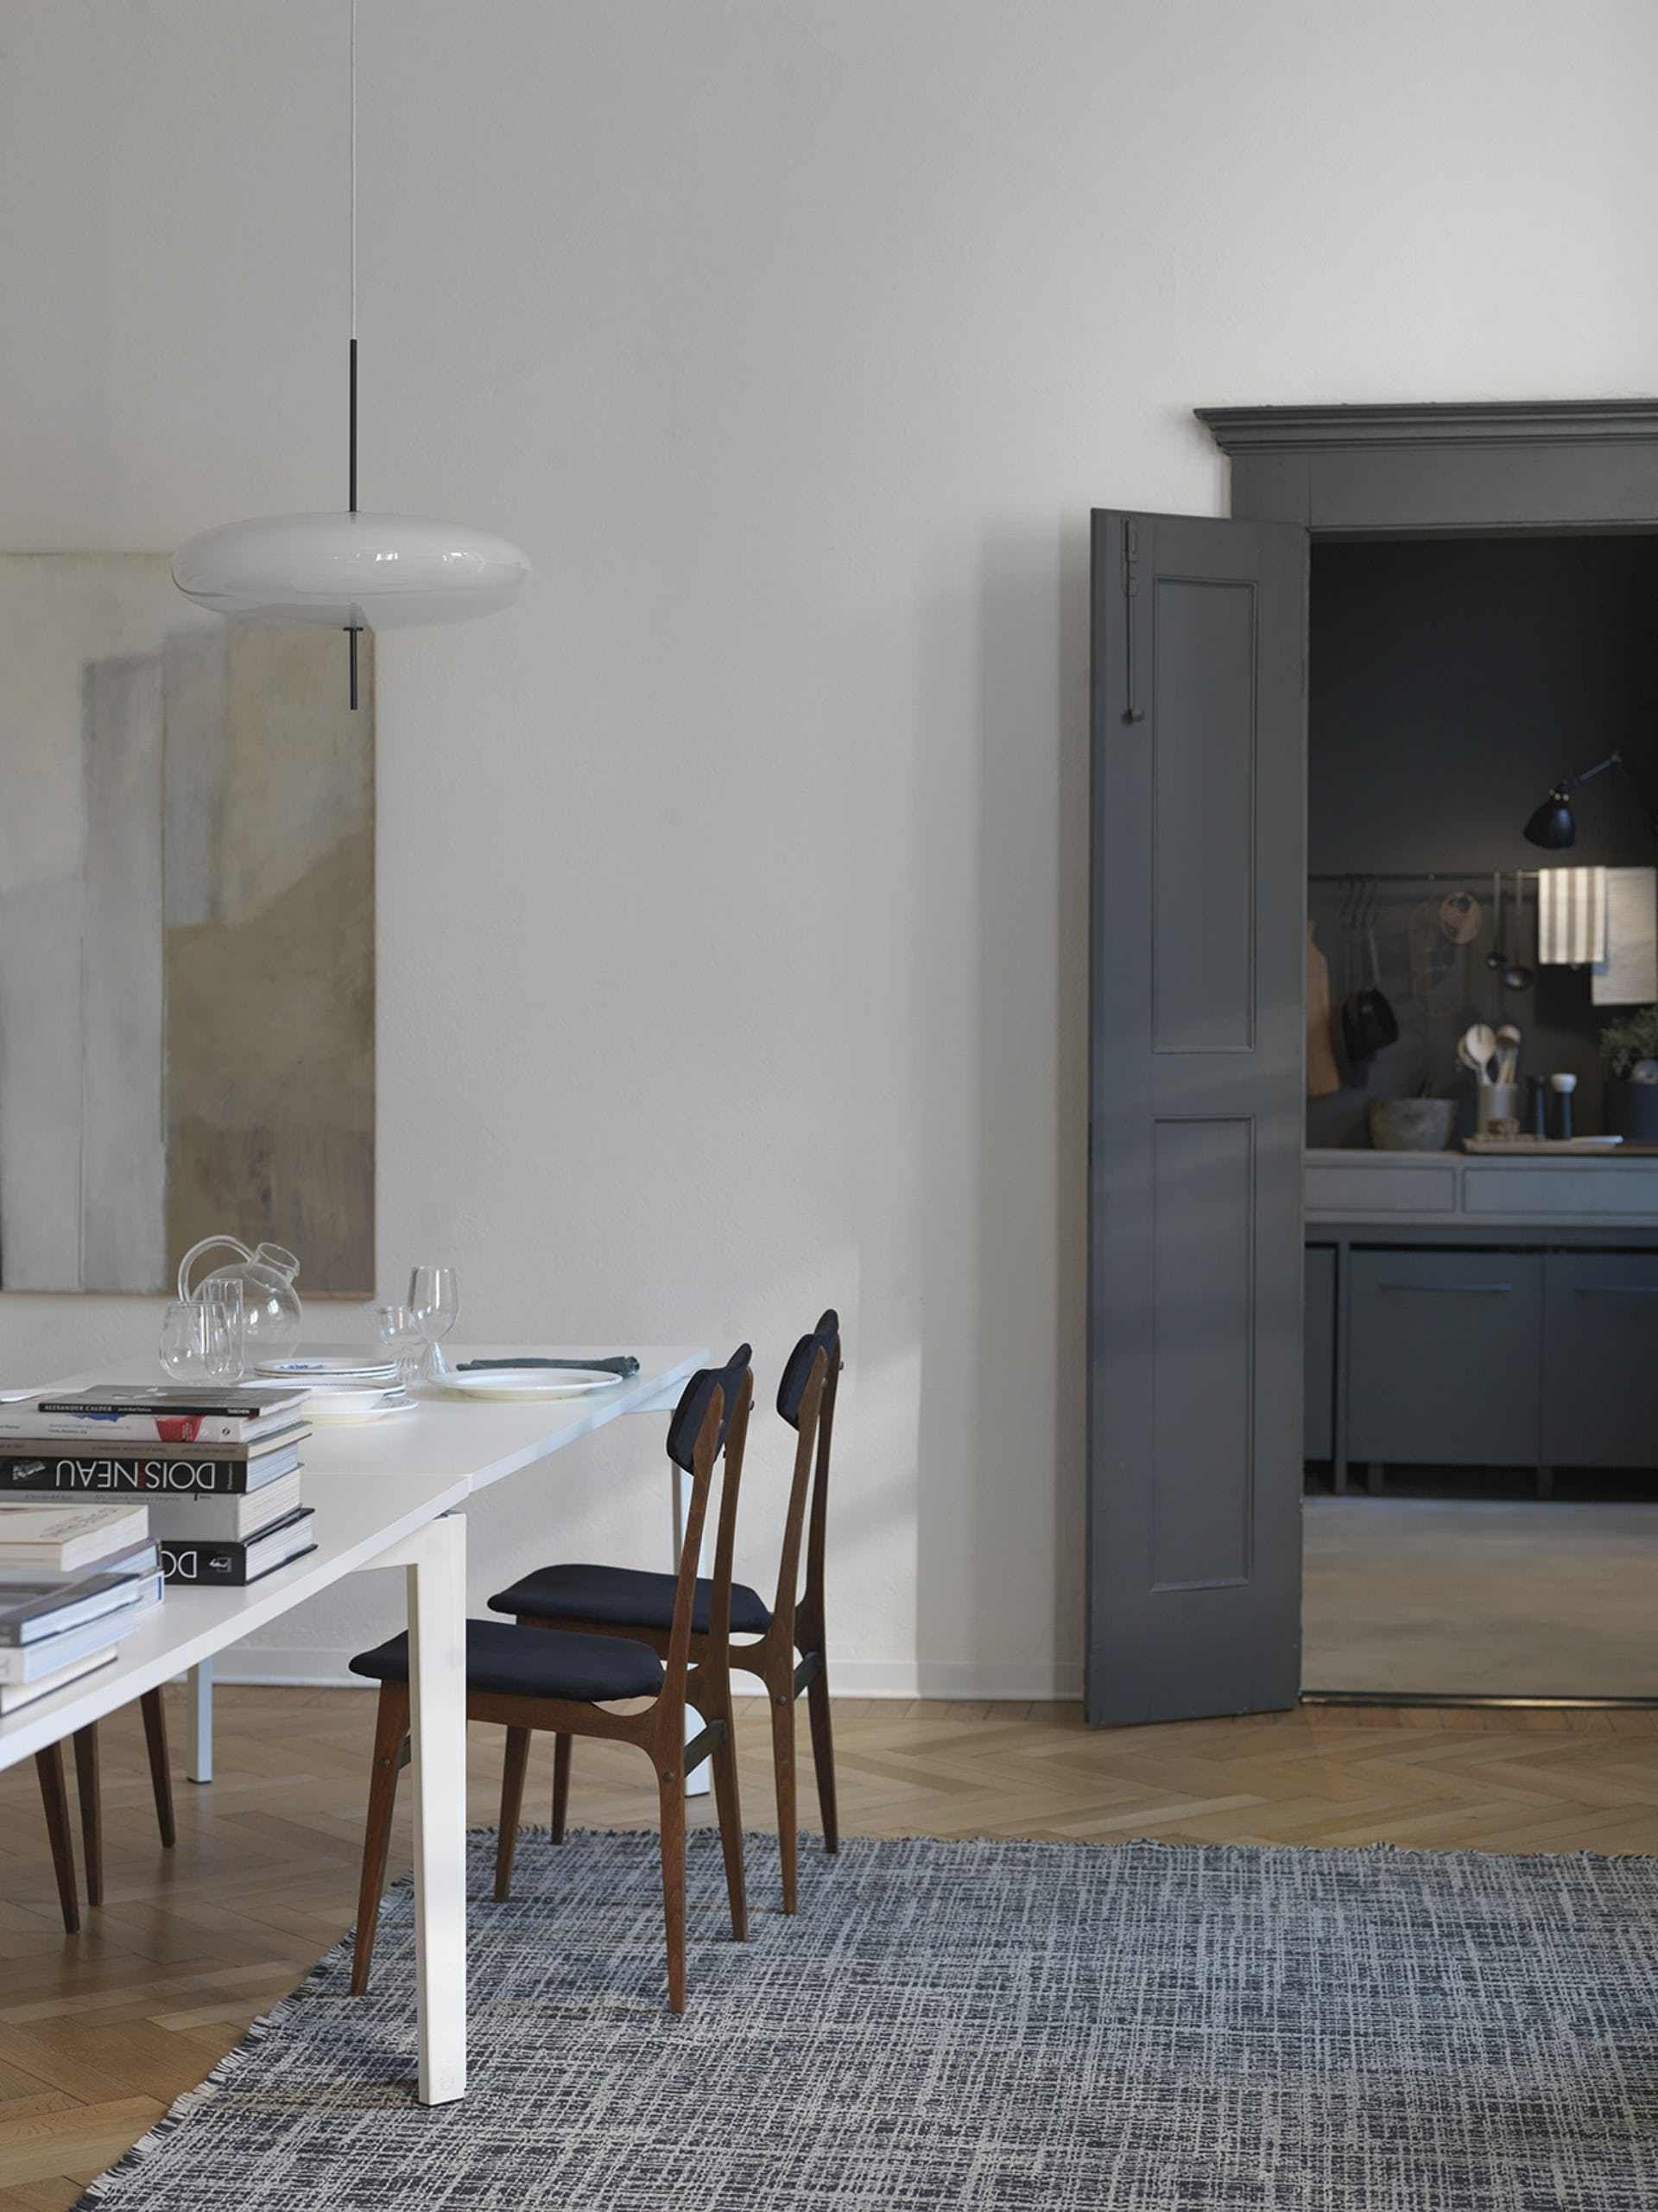 Stunning Como apartment with a dark kitchen   COCO LAPINE DESIGN ...